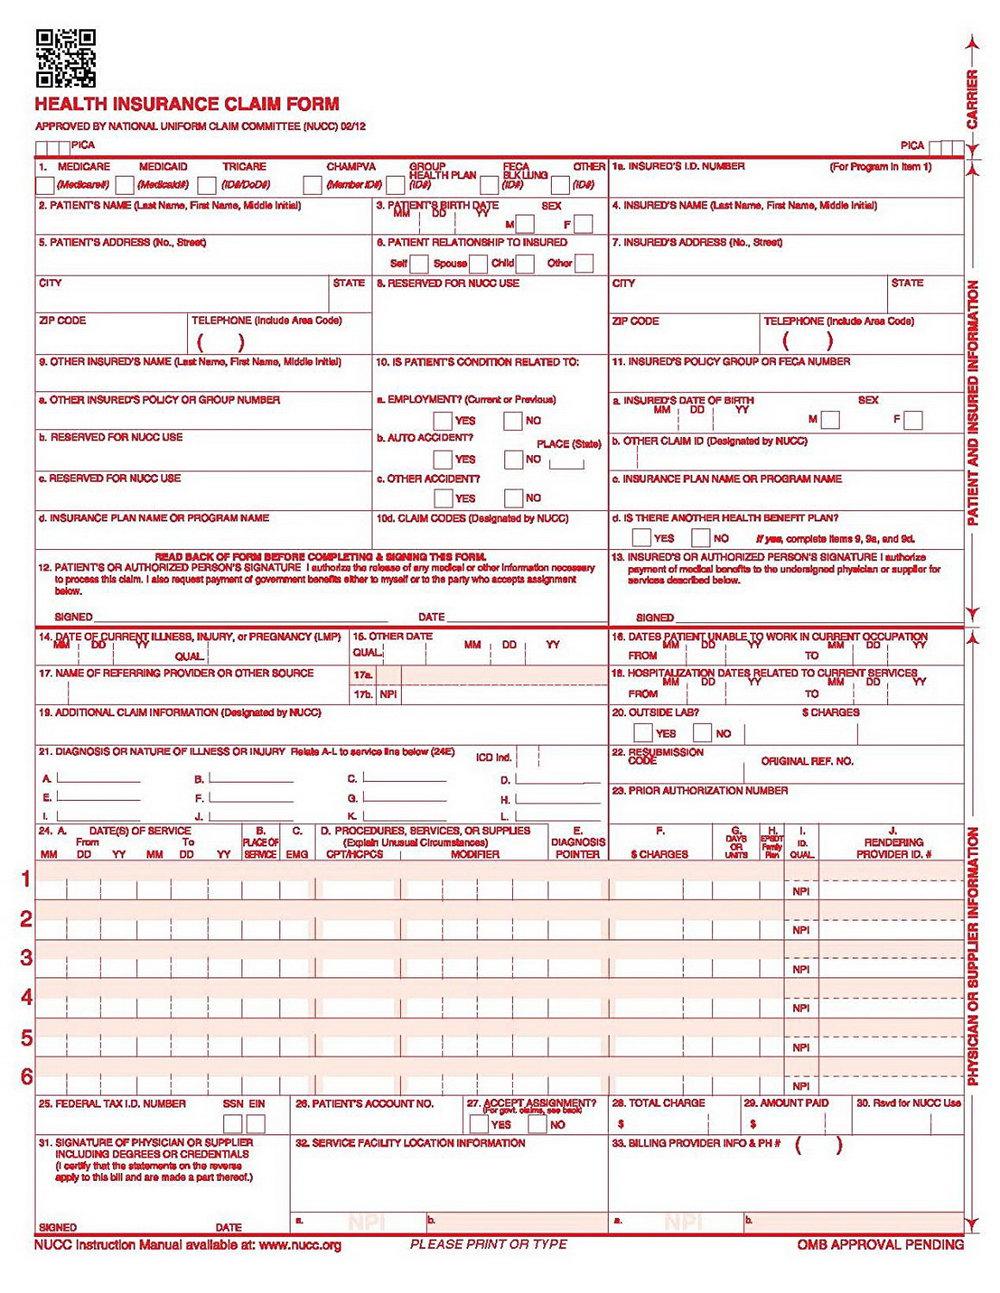 Sample Of 1500 Health Insurance Claim Form